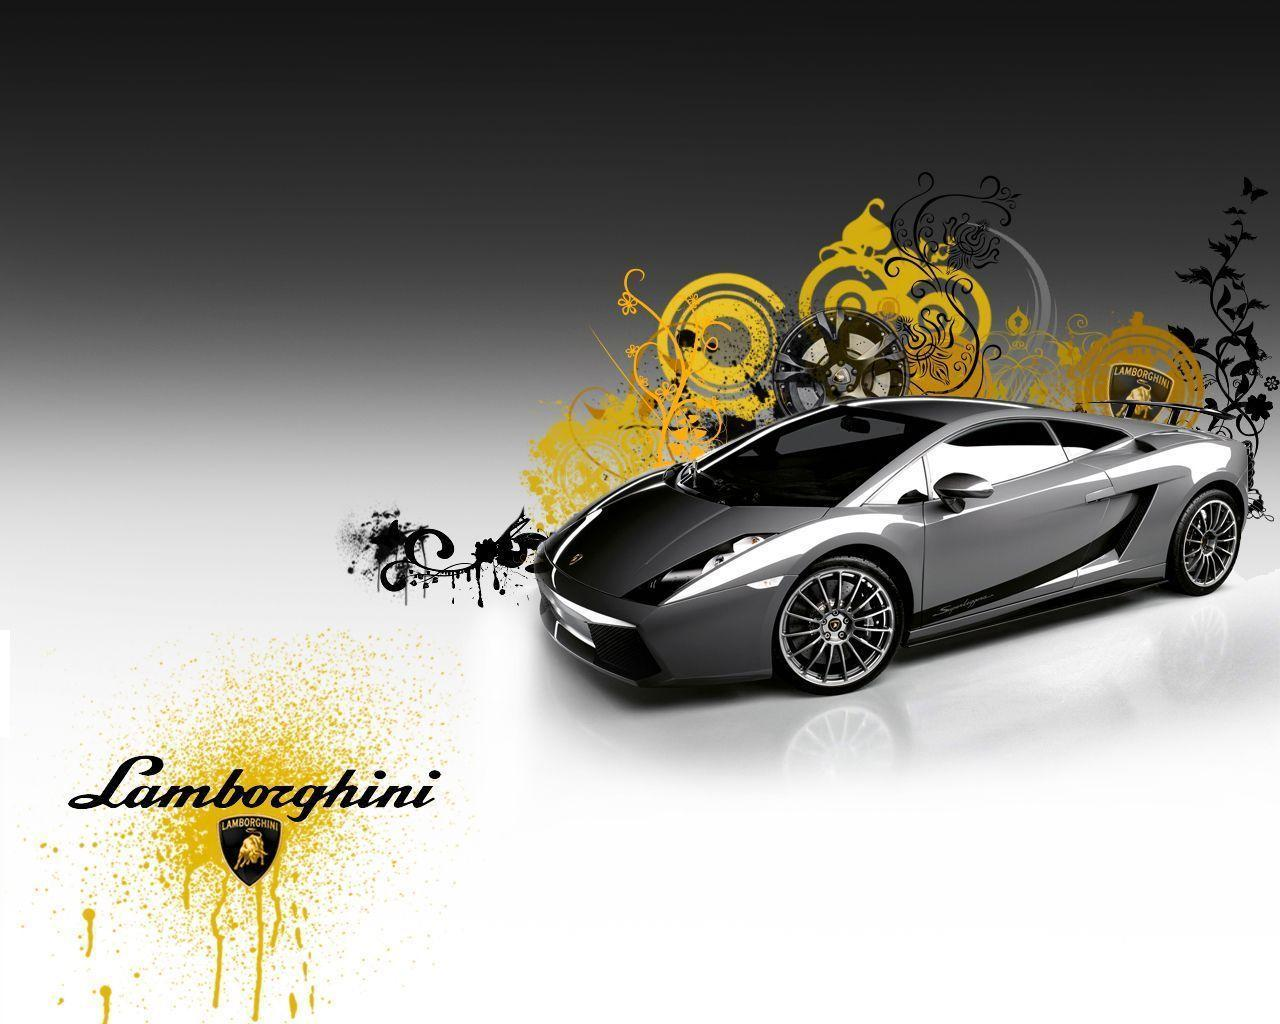 Lamborghini wallpapers | Lamborghini background - Page 35